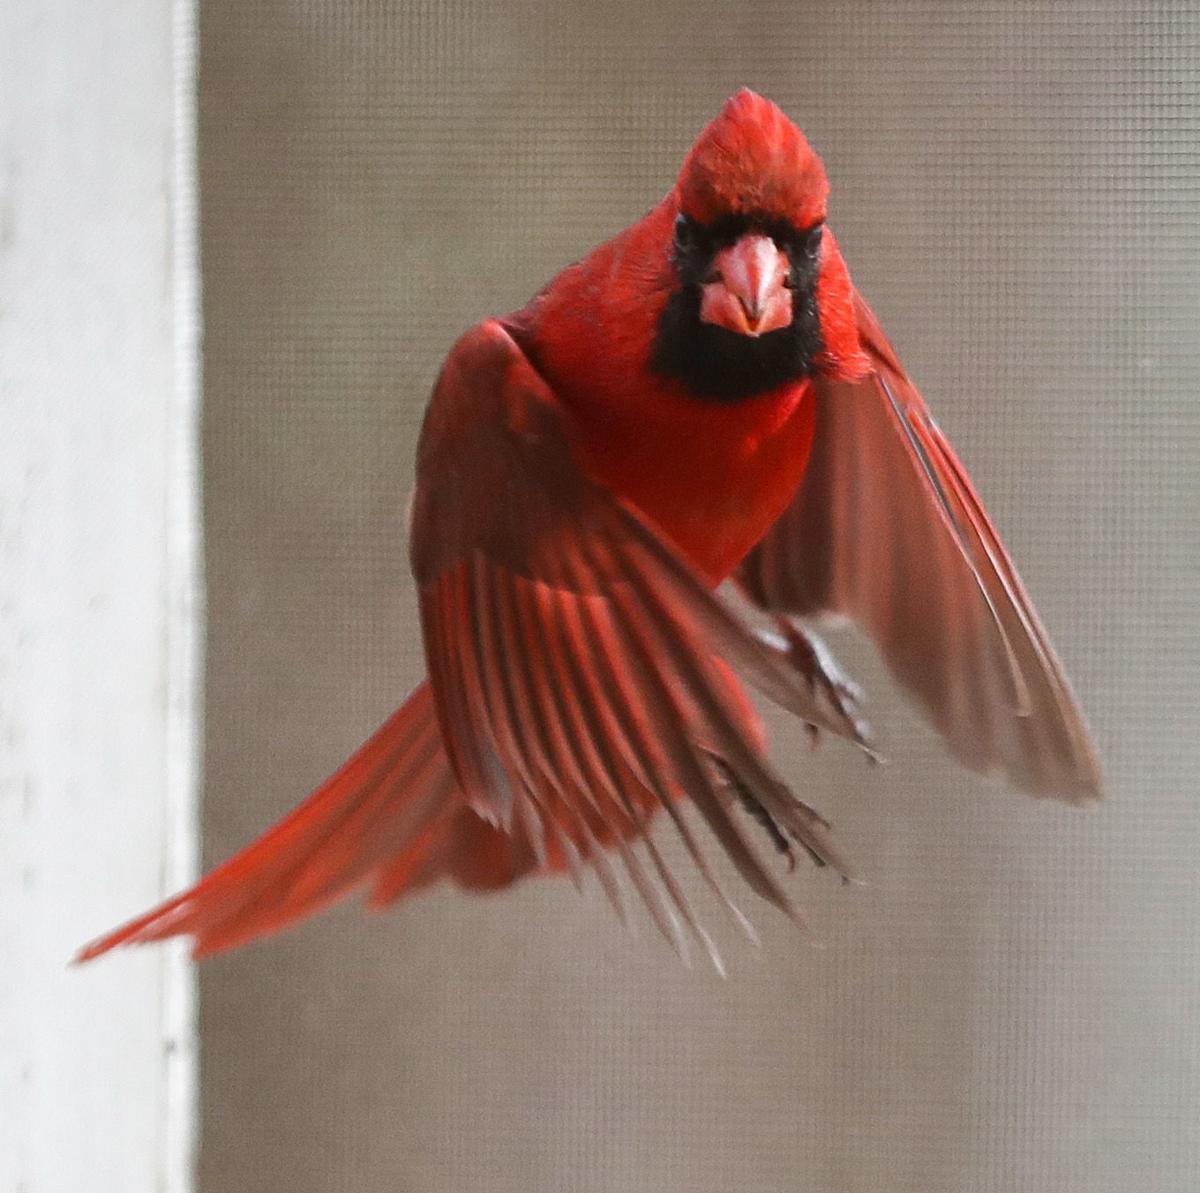 20200111_cdp_news_cardinal480.JPG